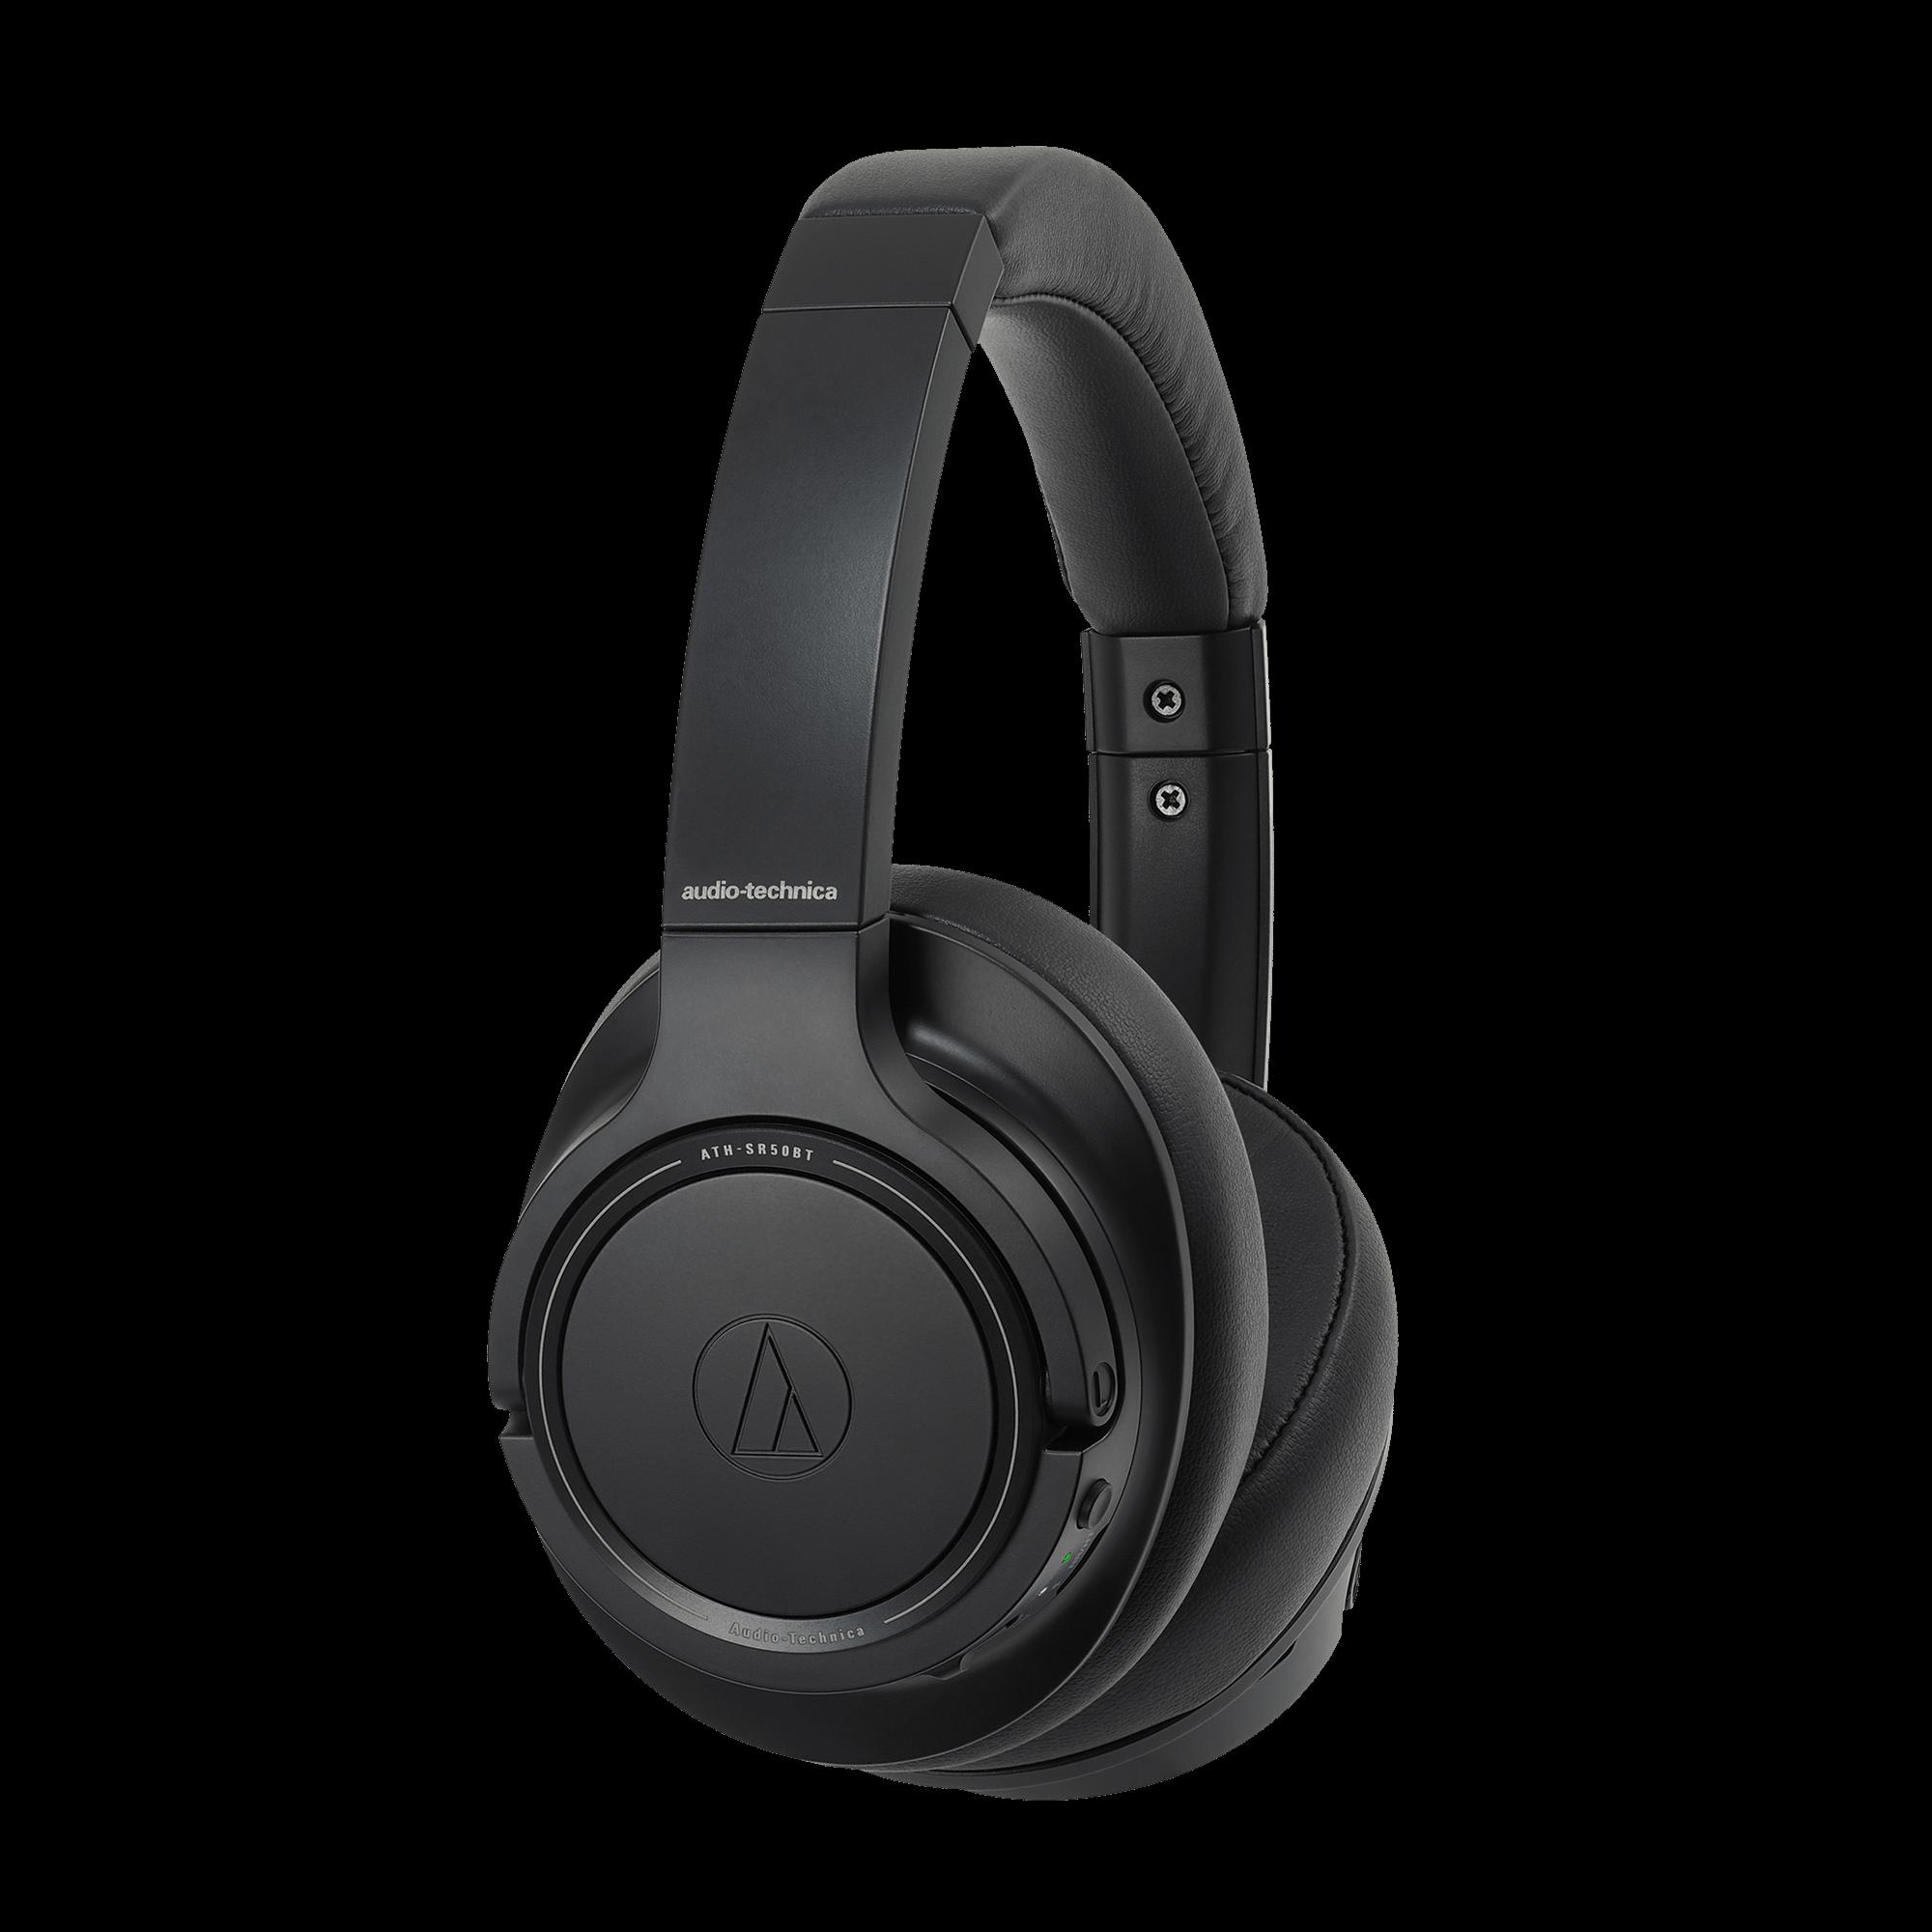 Descripción Auriculares Audio-Technica ATH-SR50BT